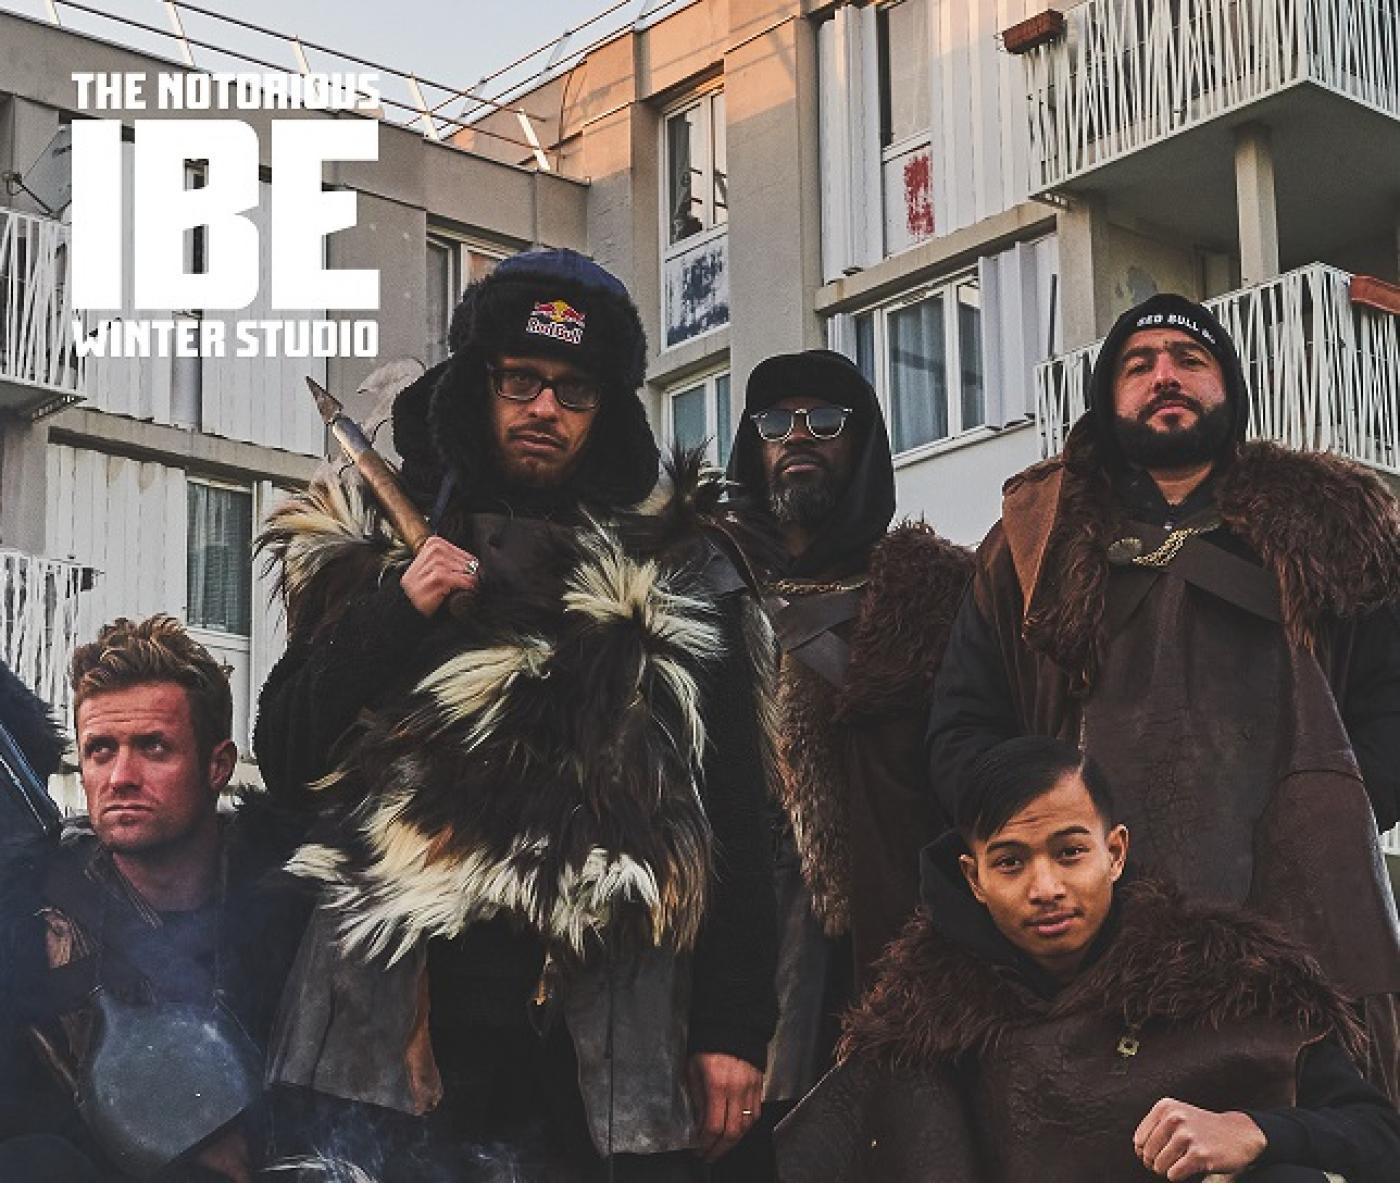 IBE Winter Studio